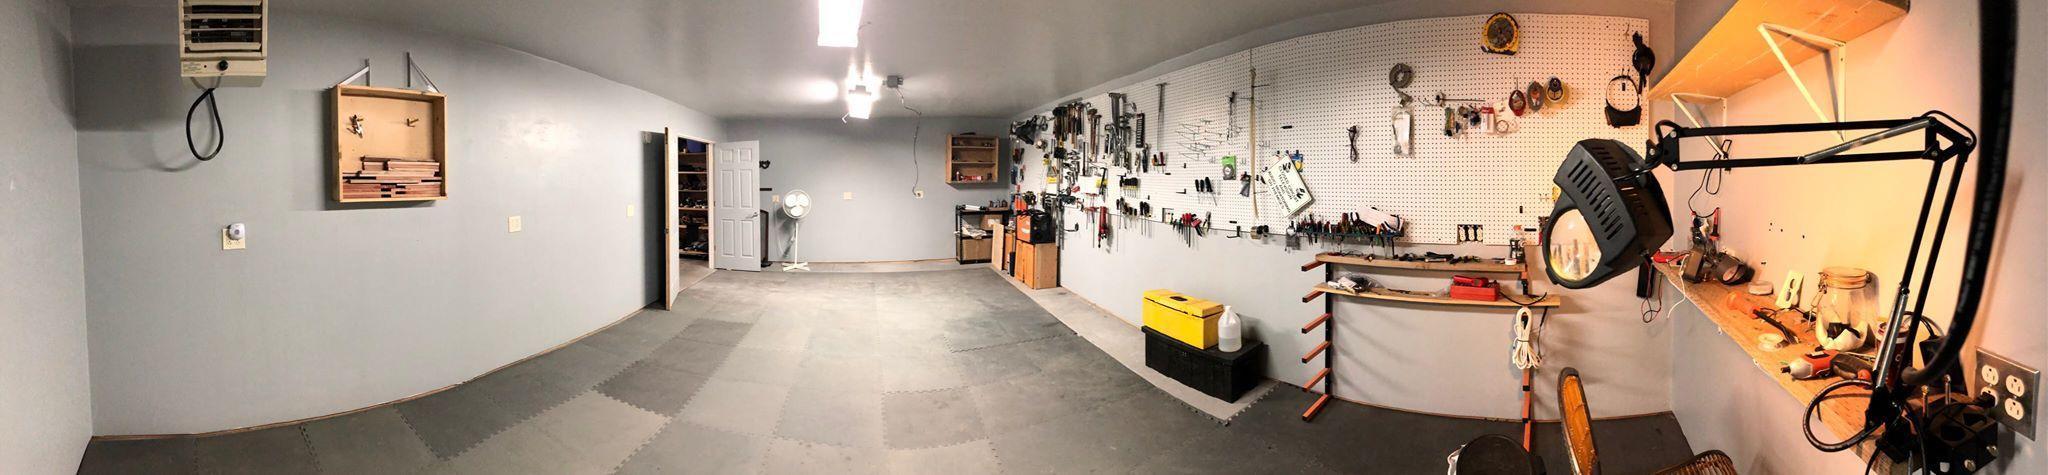 new shop pic 3